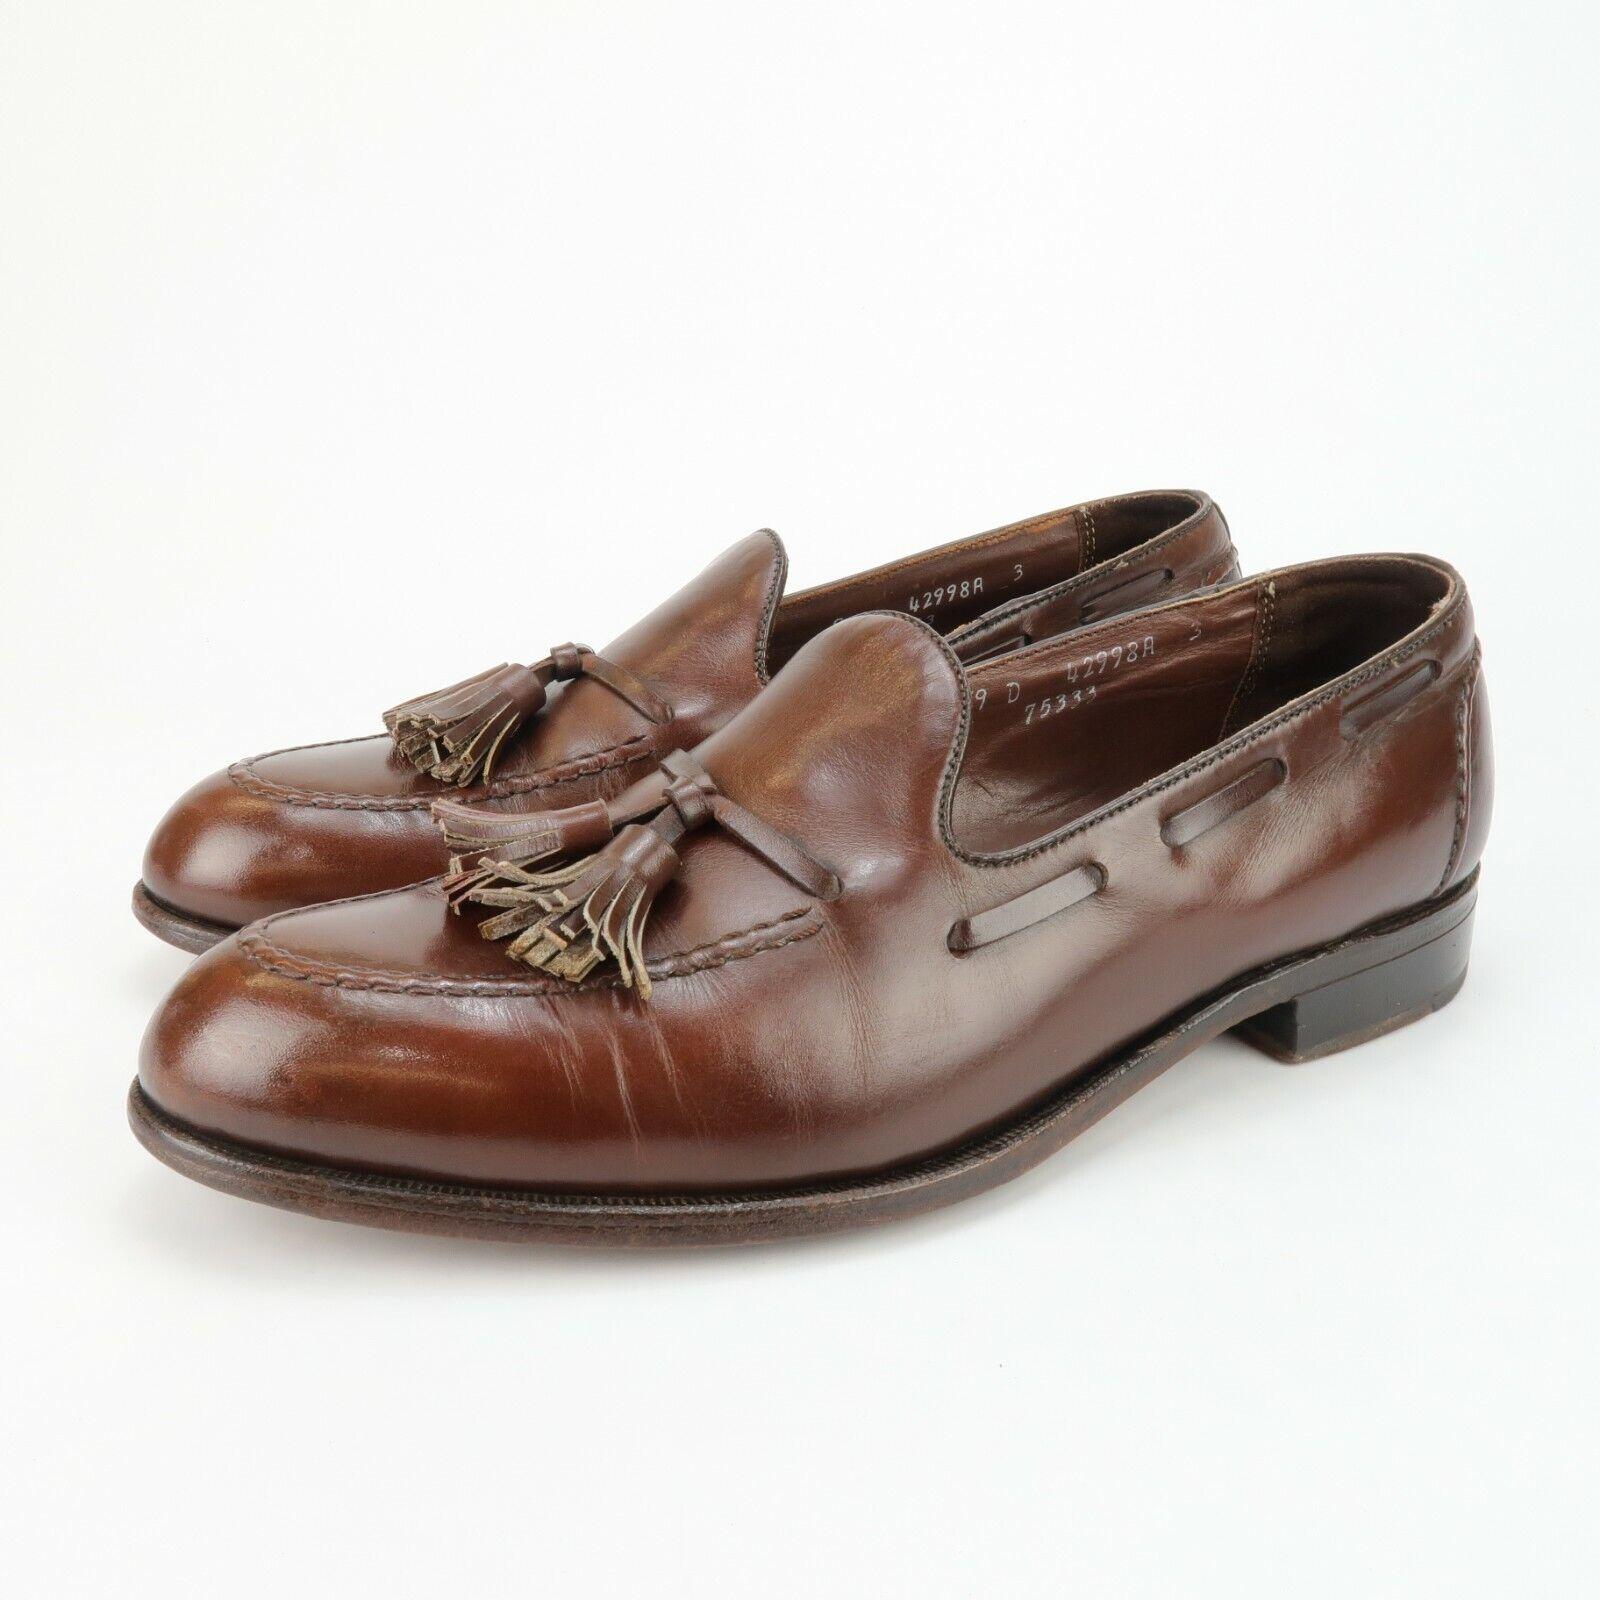 FOOTJOY CLASSICS Mens Tassel Loafers